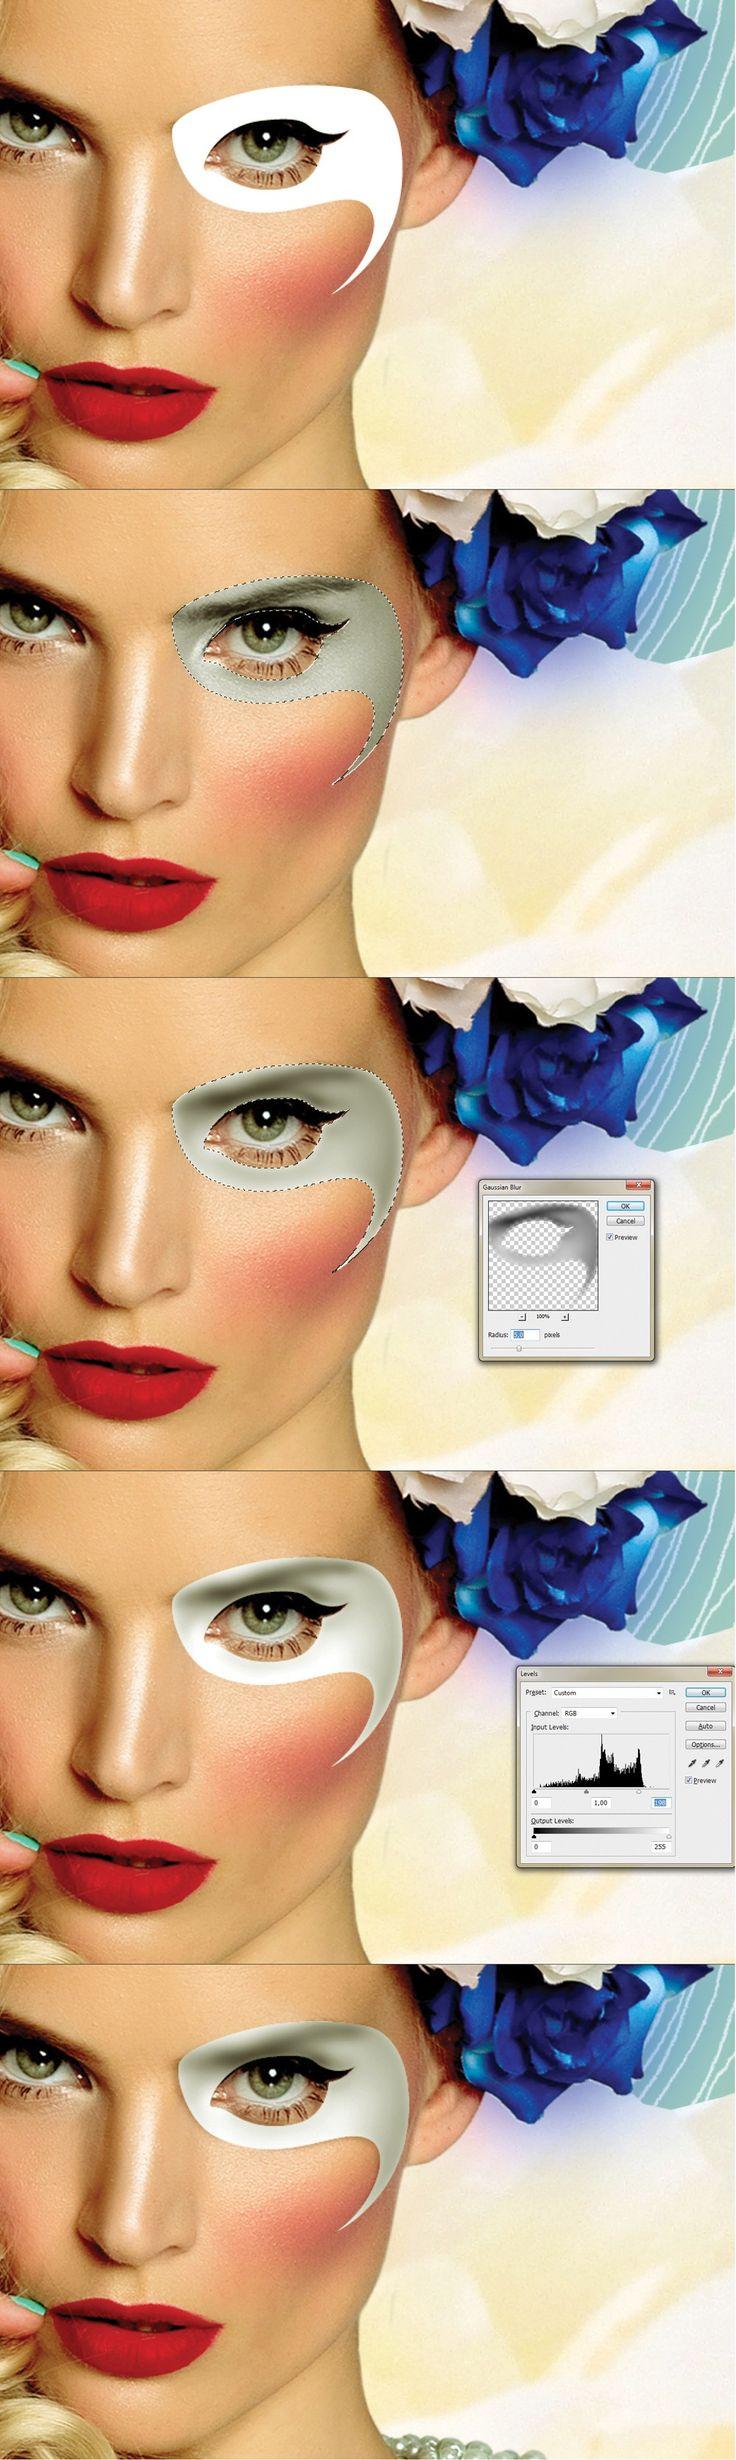 Photoshop tutorial: Advanced compositing techniques - Digital Arts